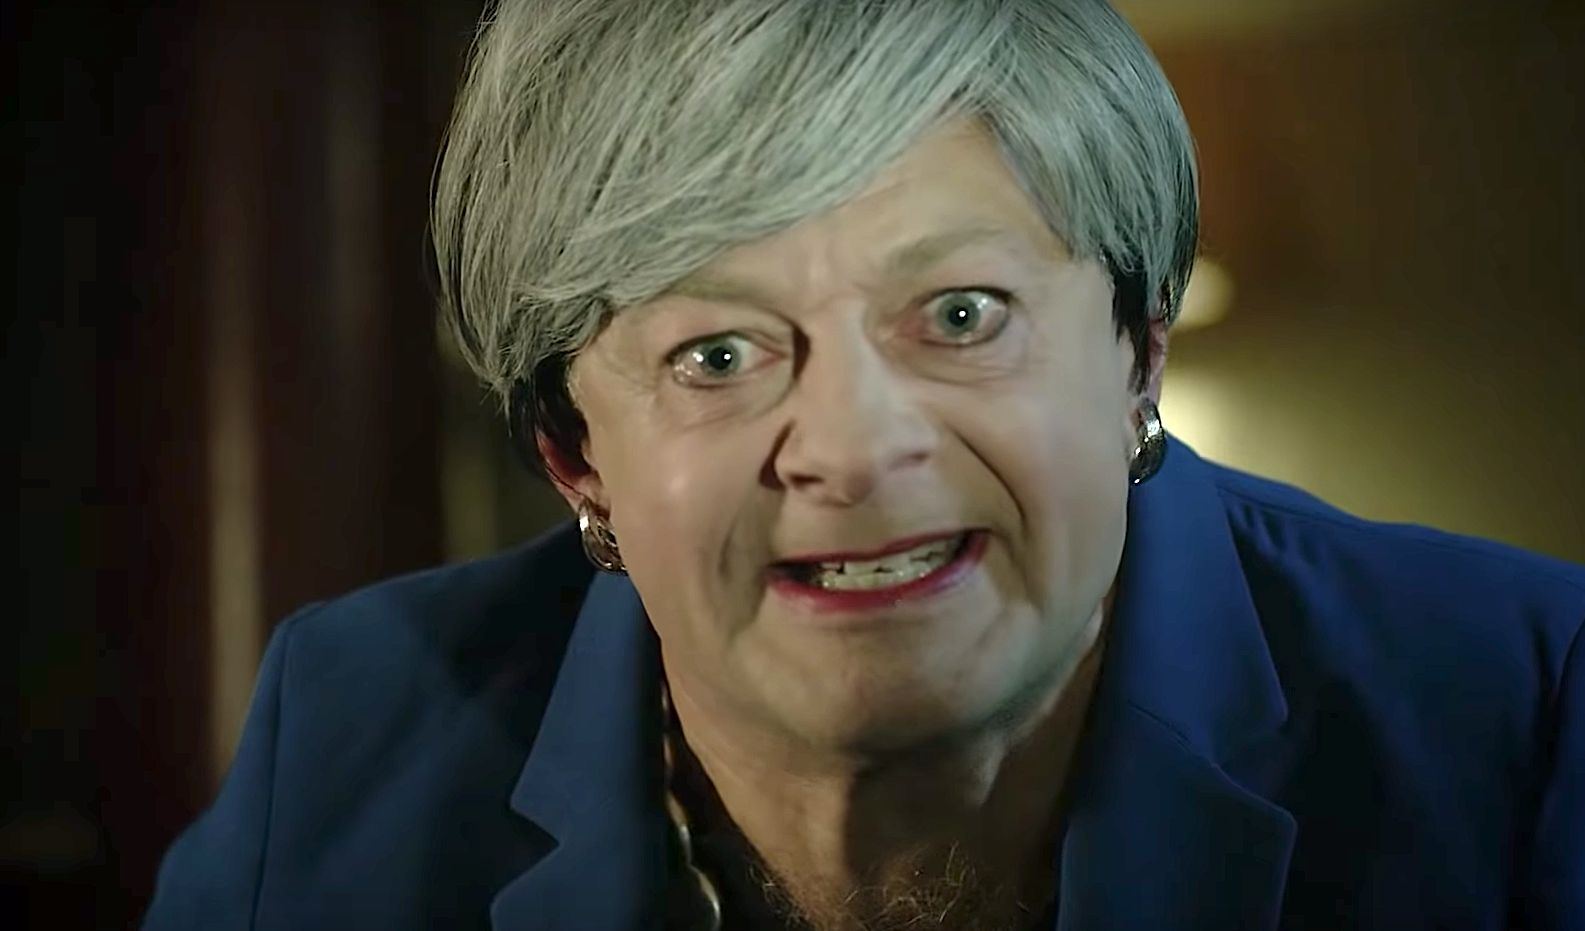 British PM Theresa May Goes Full Gollum In Precious Andy Serkis Parody